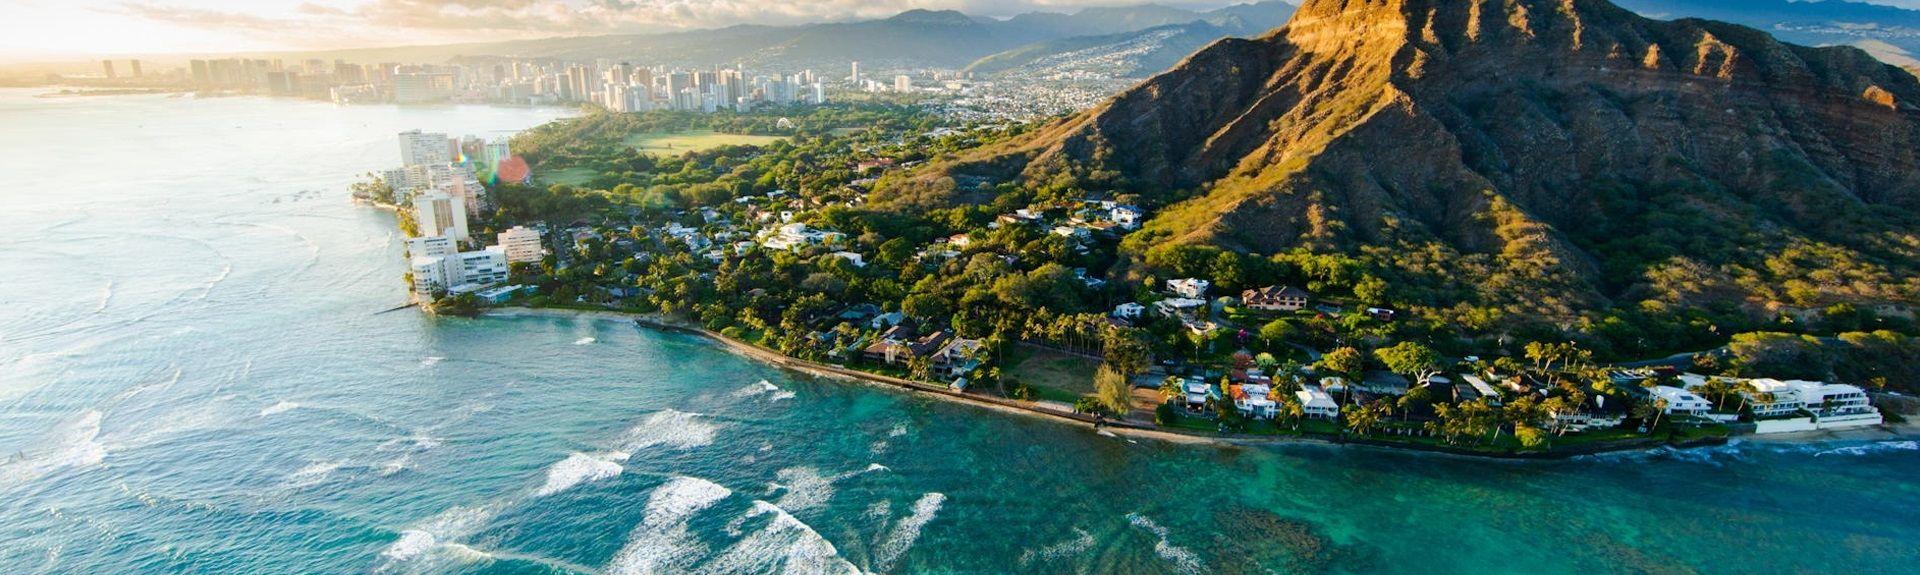 Waikiki Banyan (Honolulu, Hawaï, États-Unis d'Amérique)